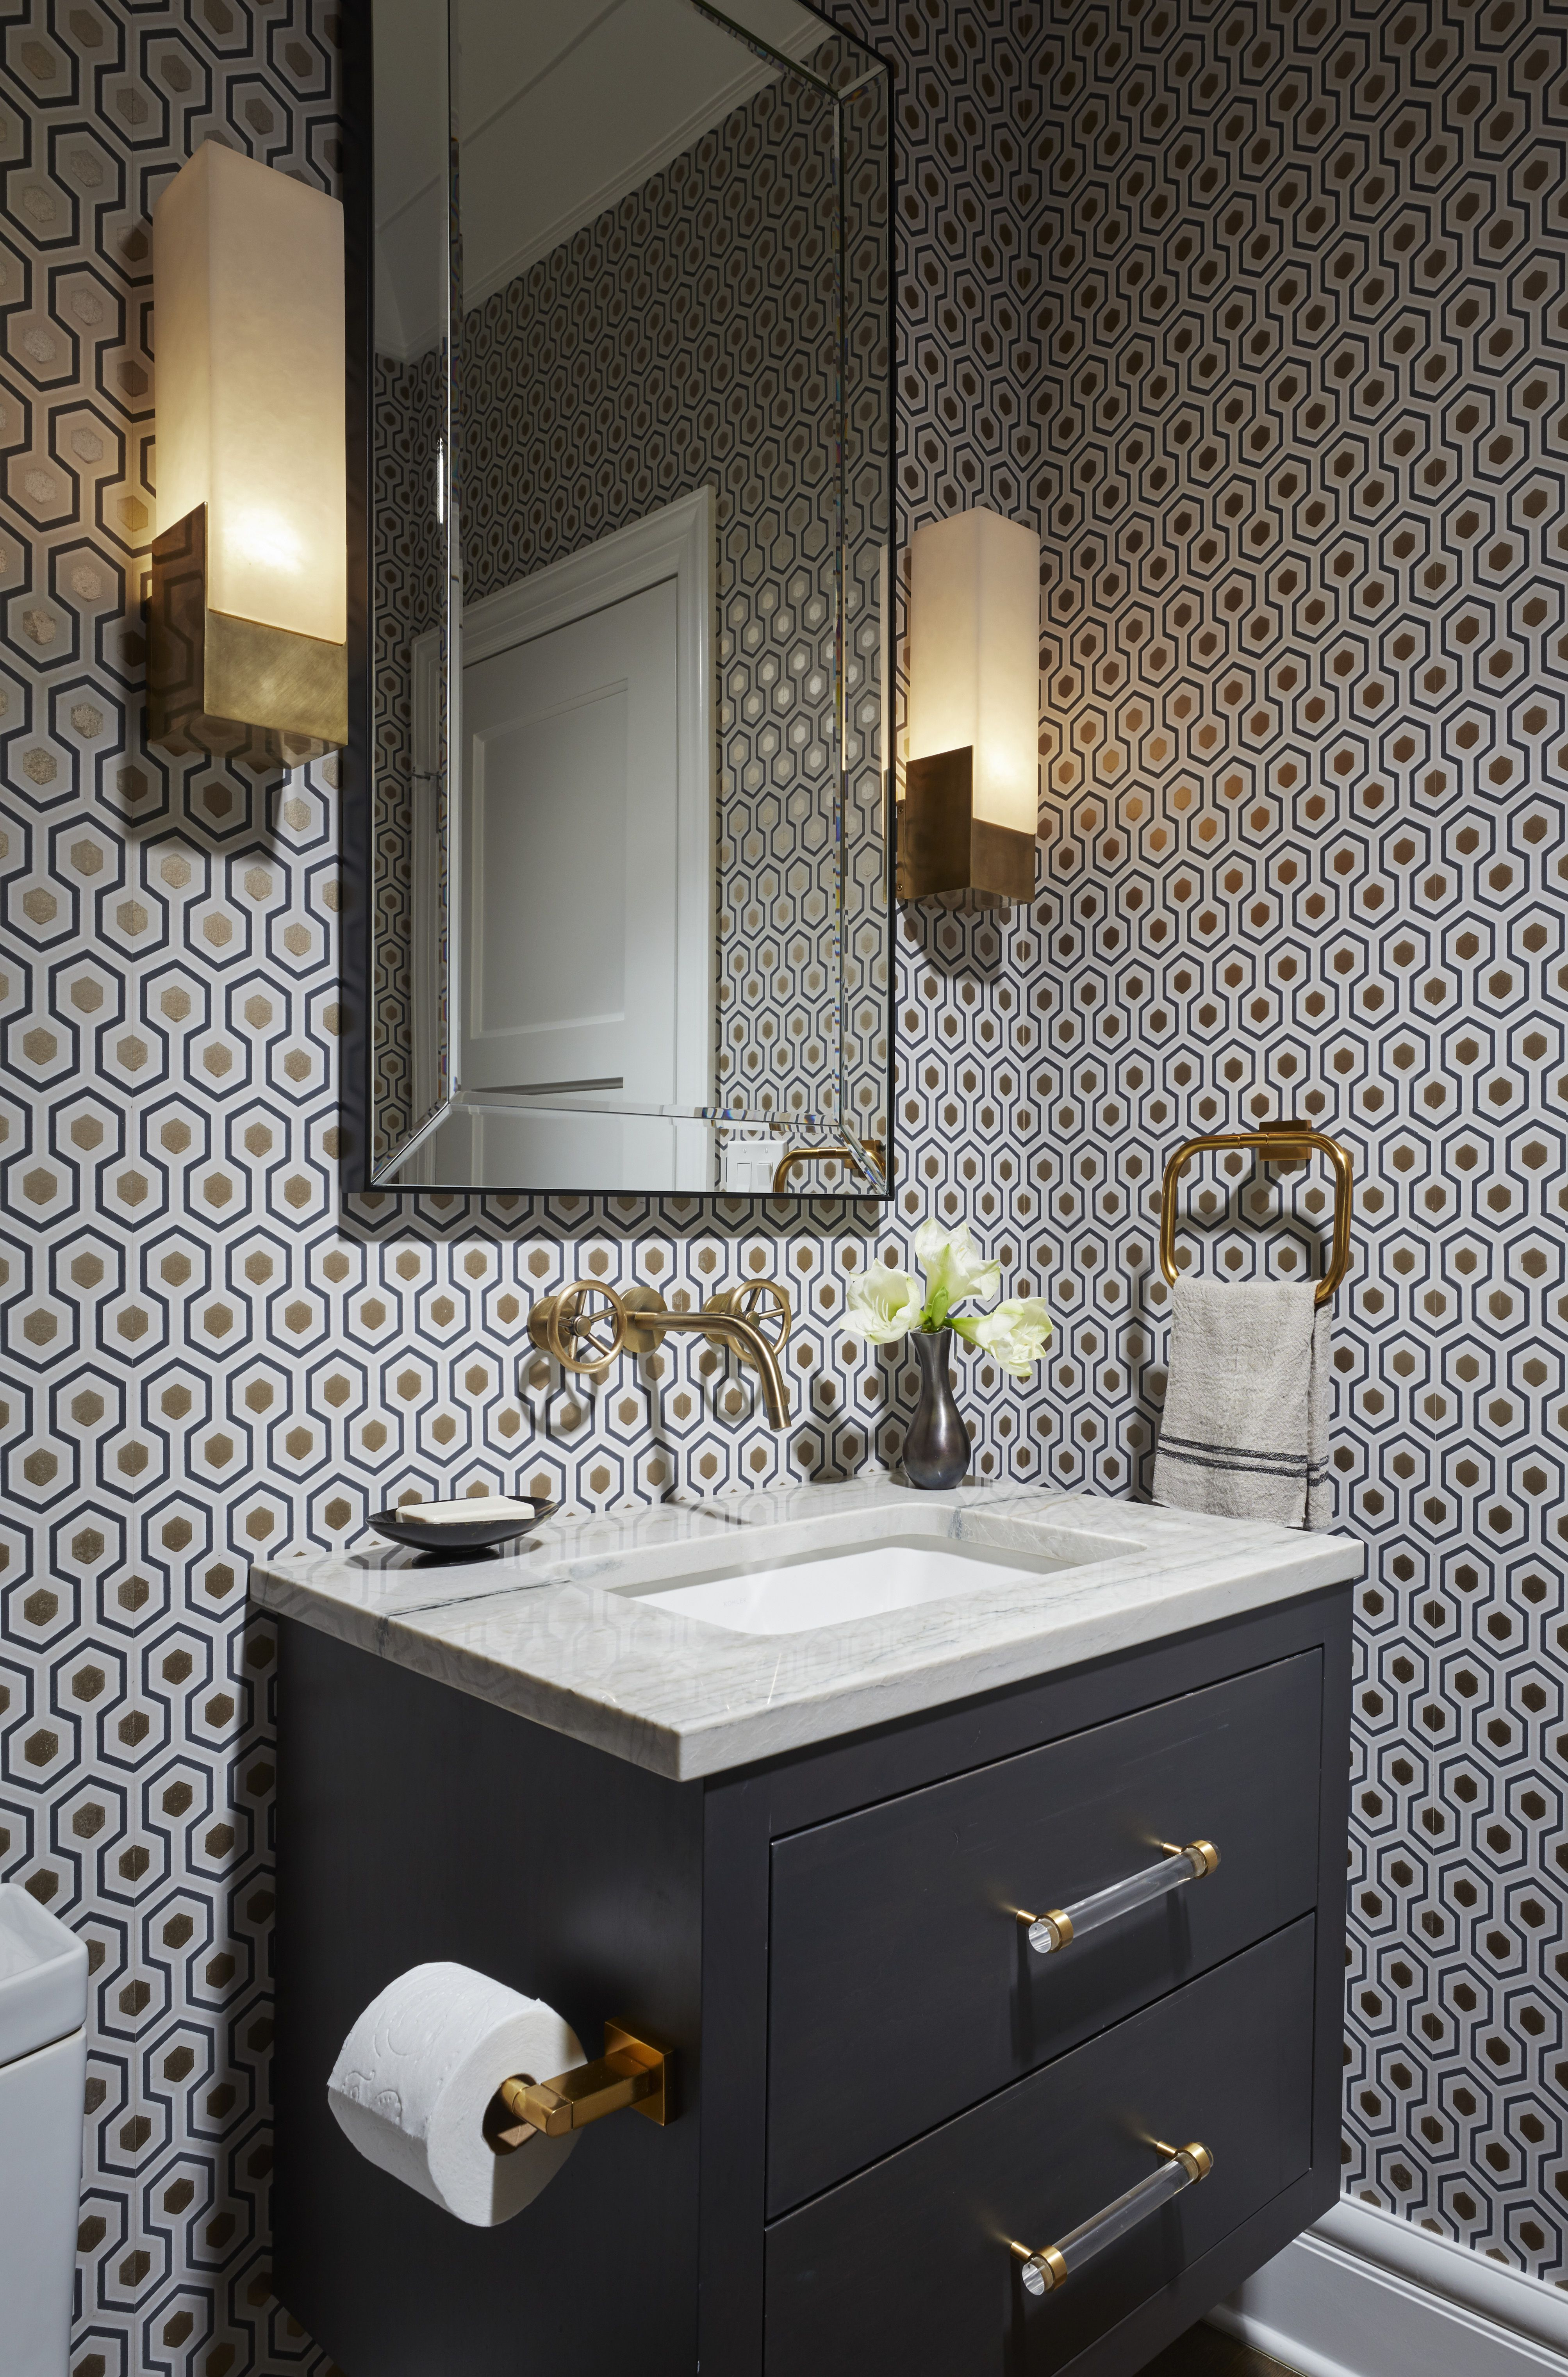 30 Best Bathroom Paint Colors 2020 Bathroom Paint Ideas,Indian Style 5 Bedroom House Plans Single Story 3d